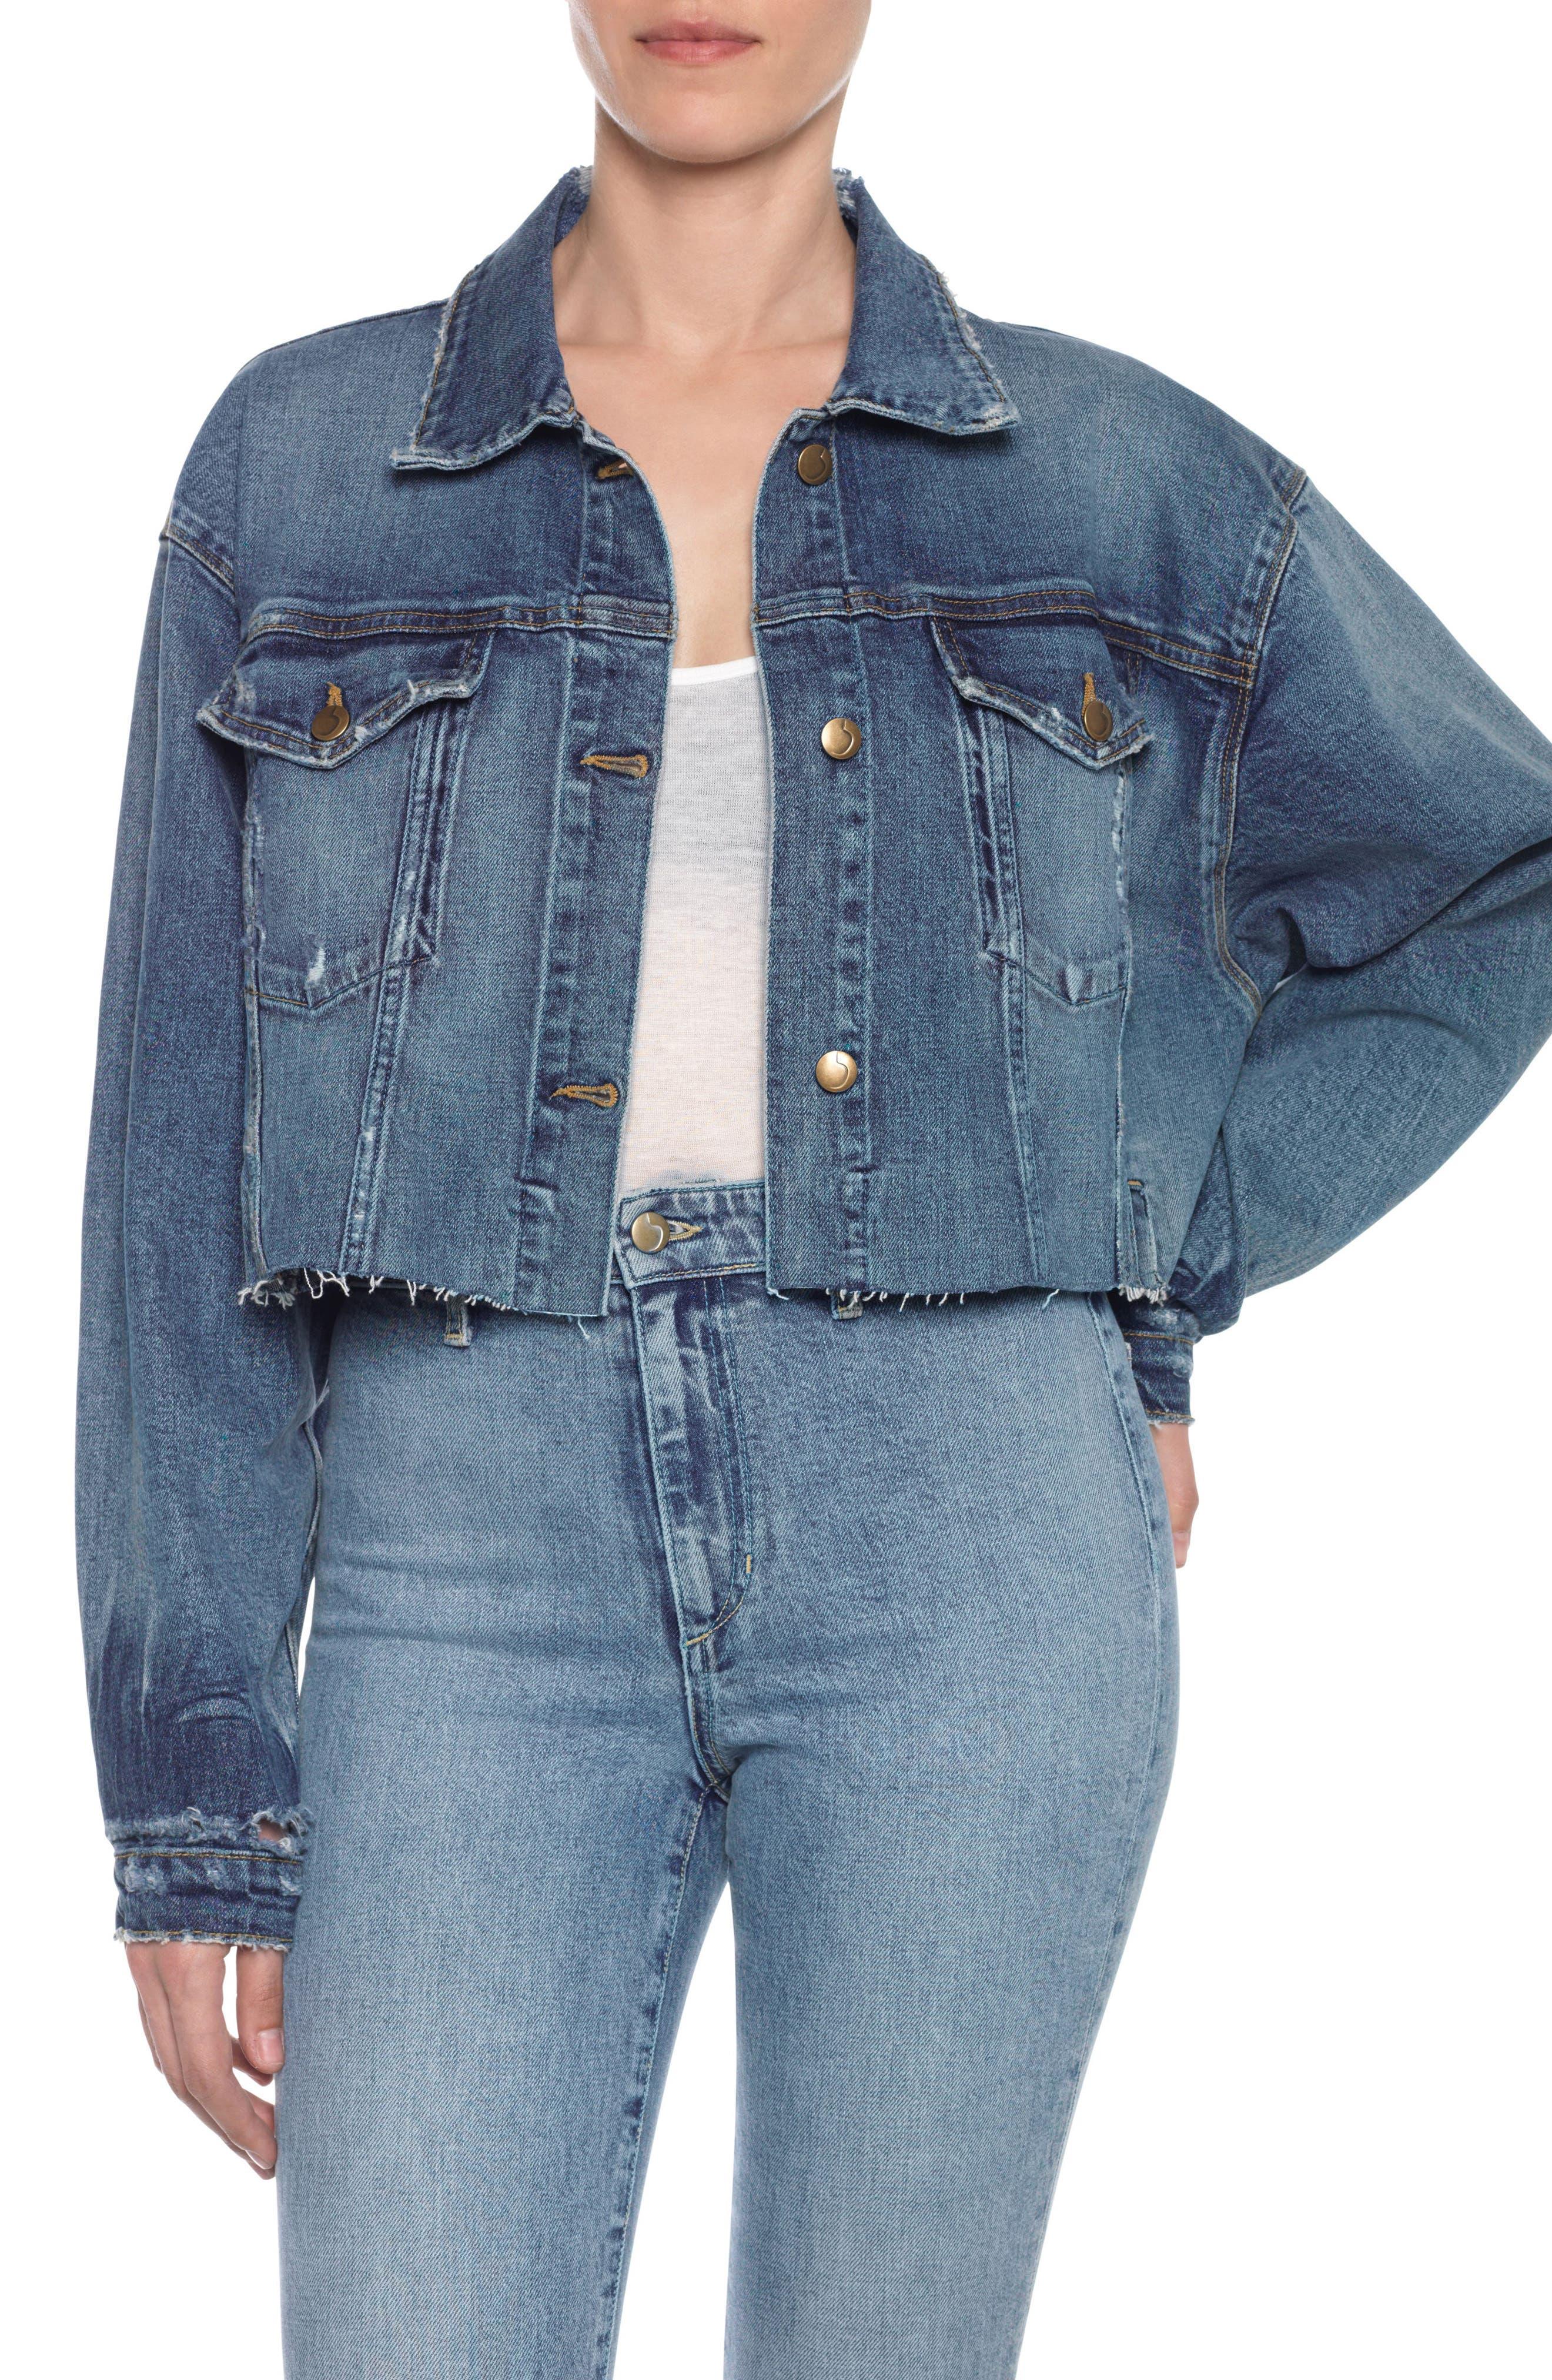 Taylor Hill x Joe's Dolman Crop Denim Jacket